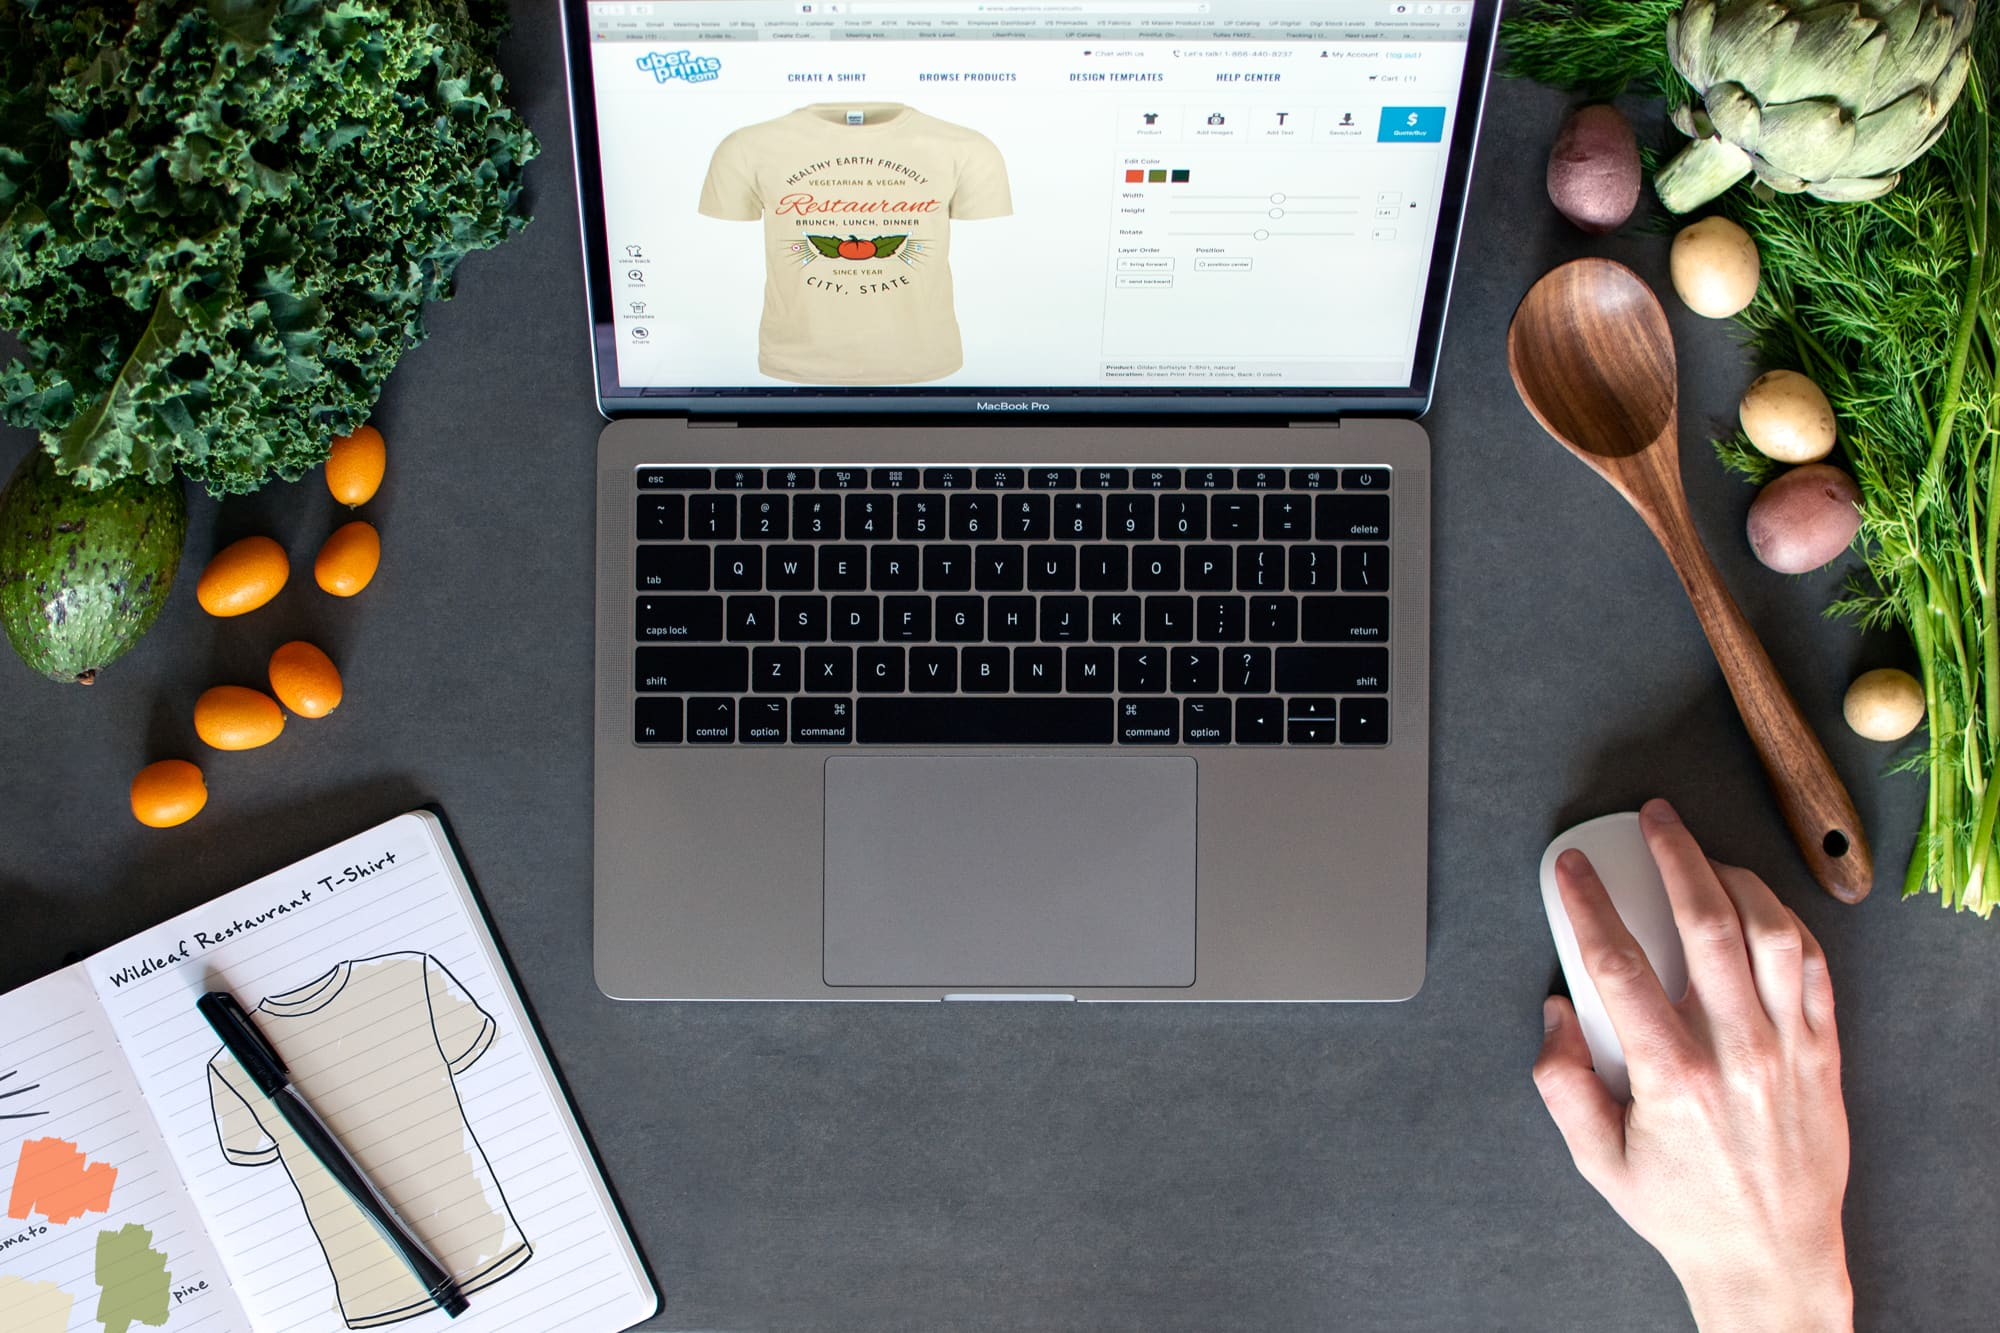 Image showing restaurant designing t-shirts on UberPrints.